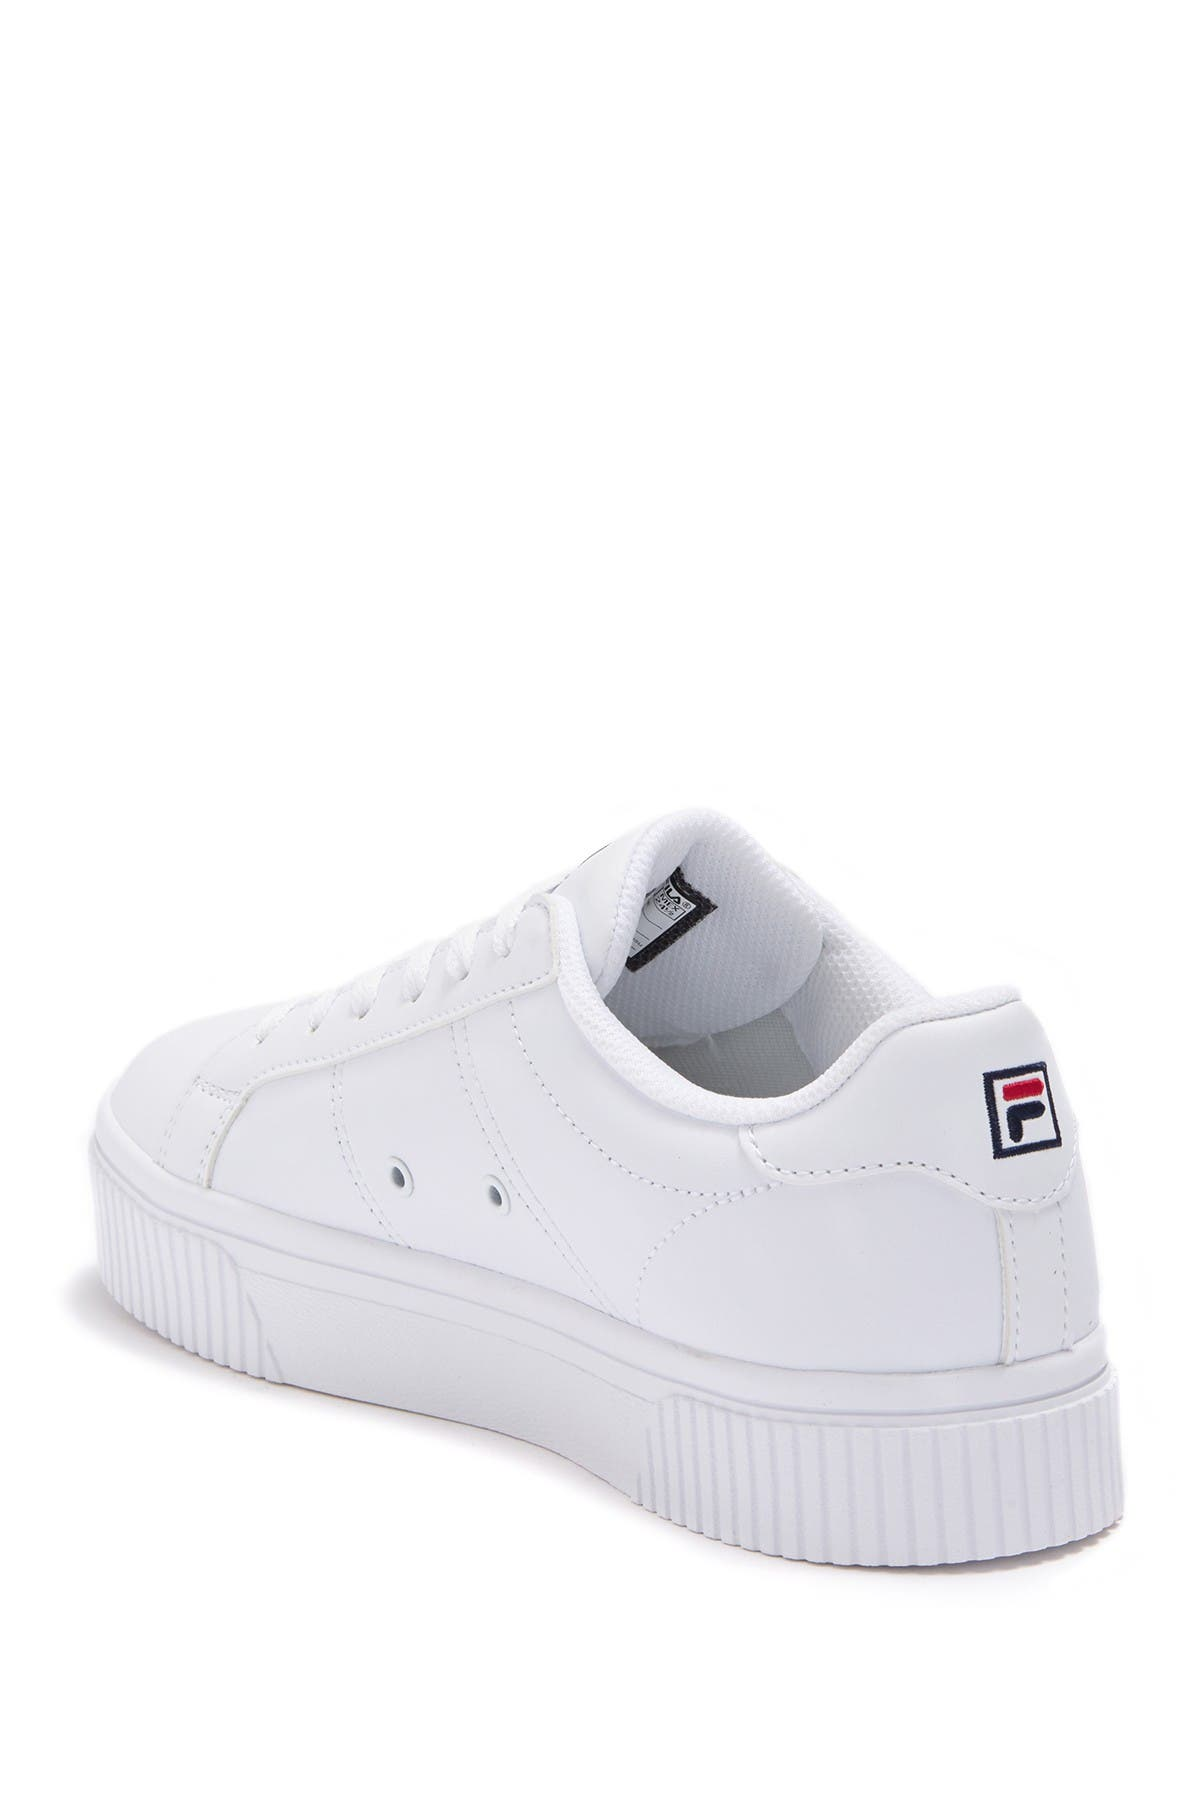 Image of FILA USA Panache Platfom Sneaker